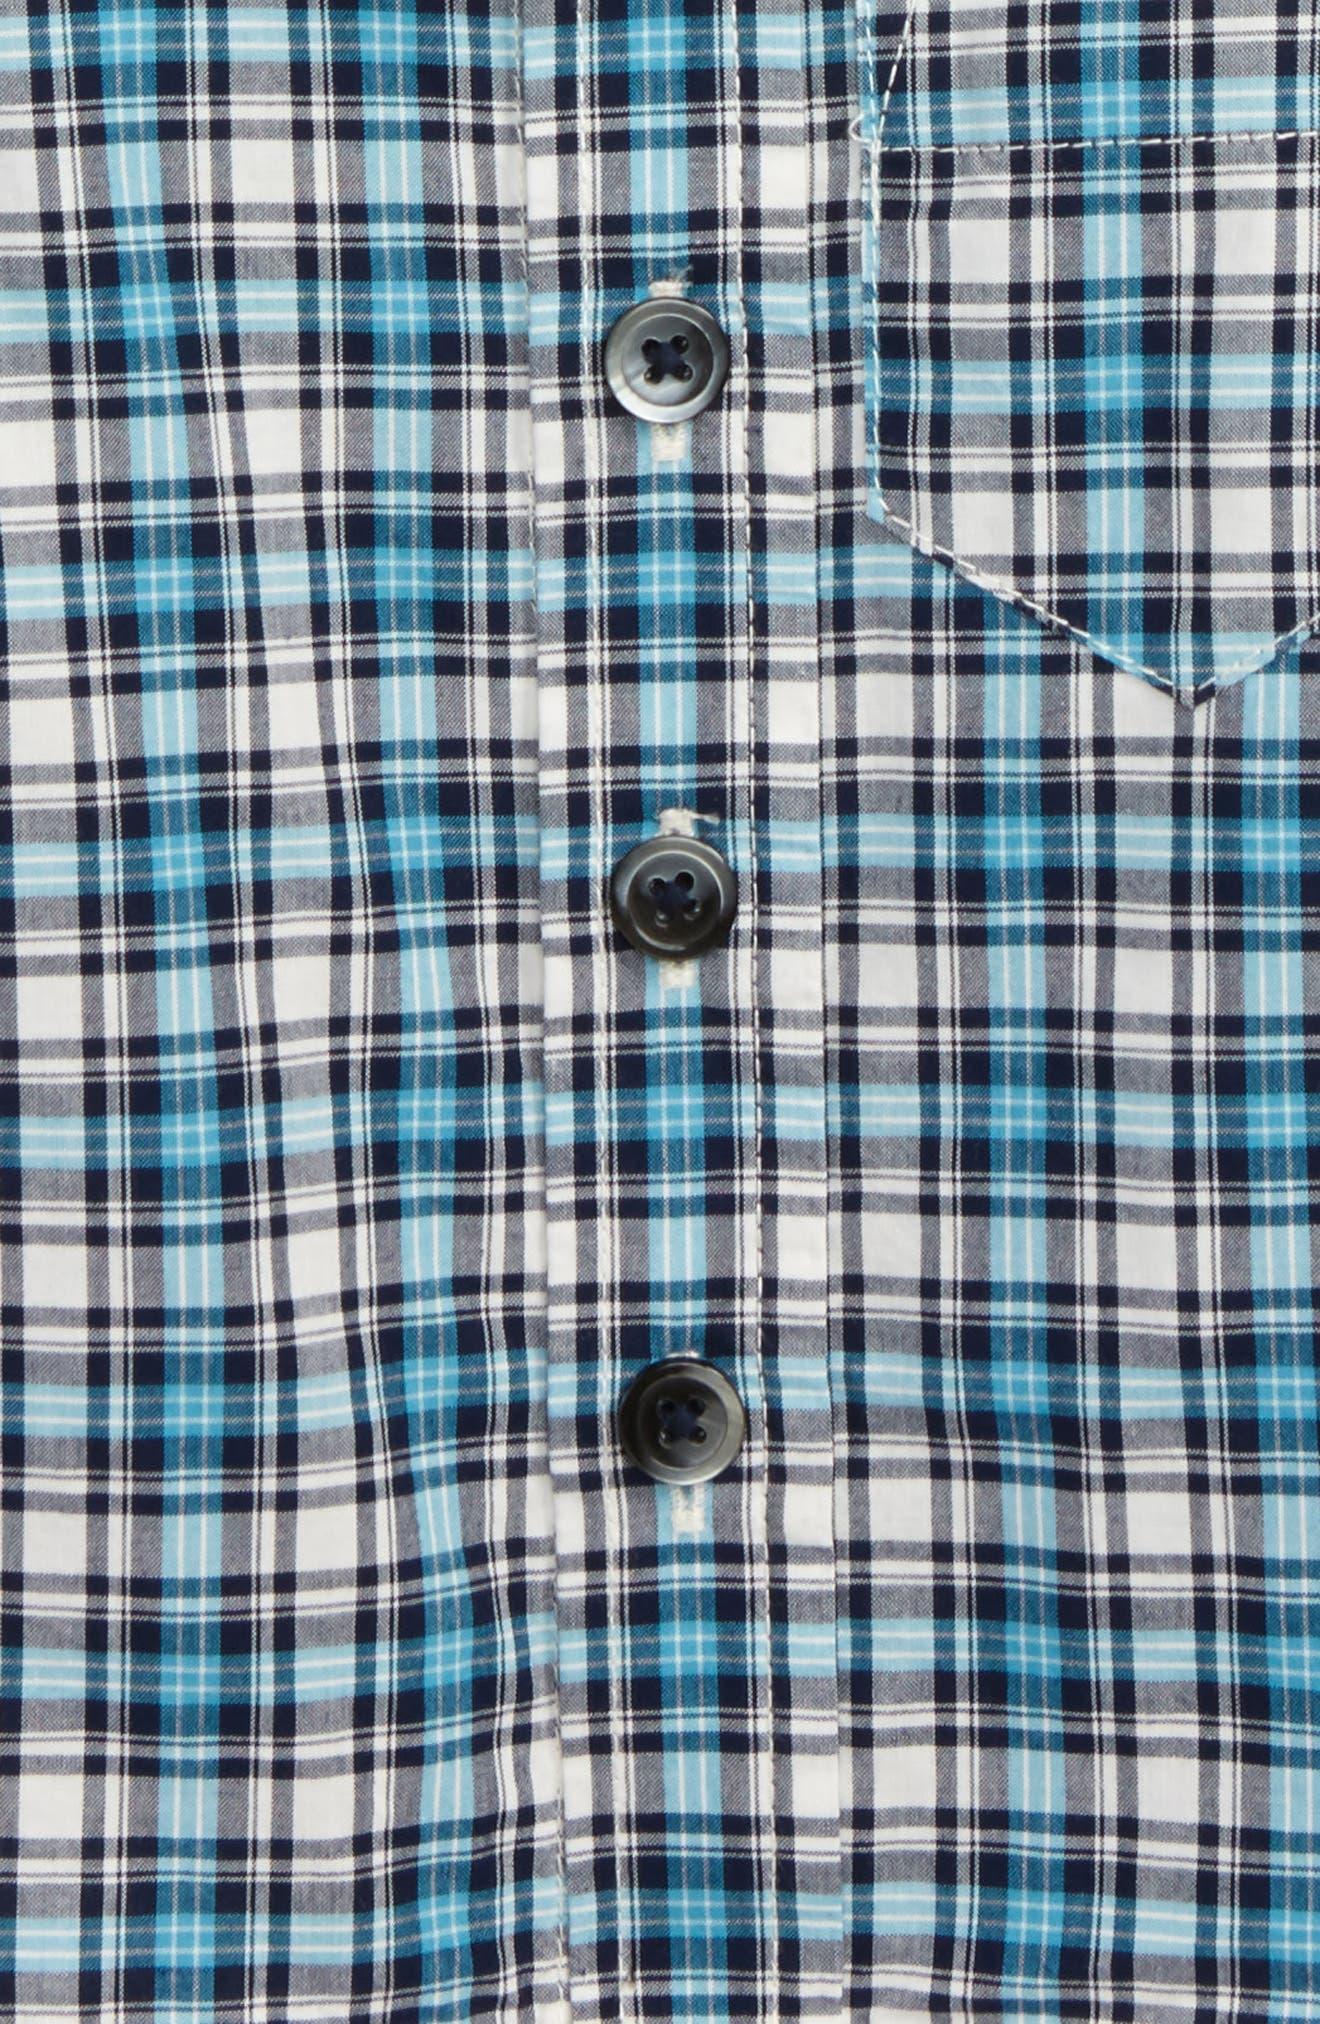 Heath Plaid Woven Shirt,                             Alternate thumbnail 2, color,                             400